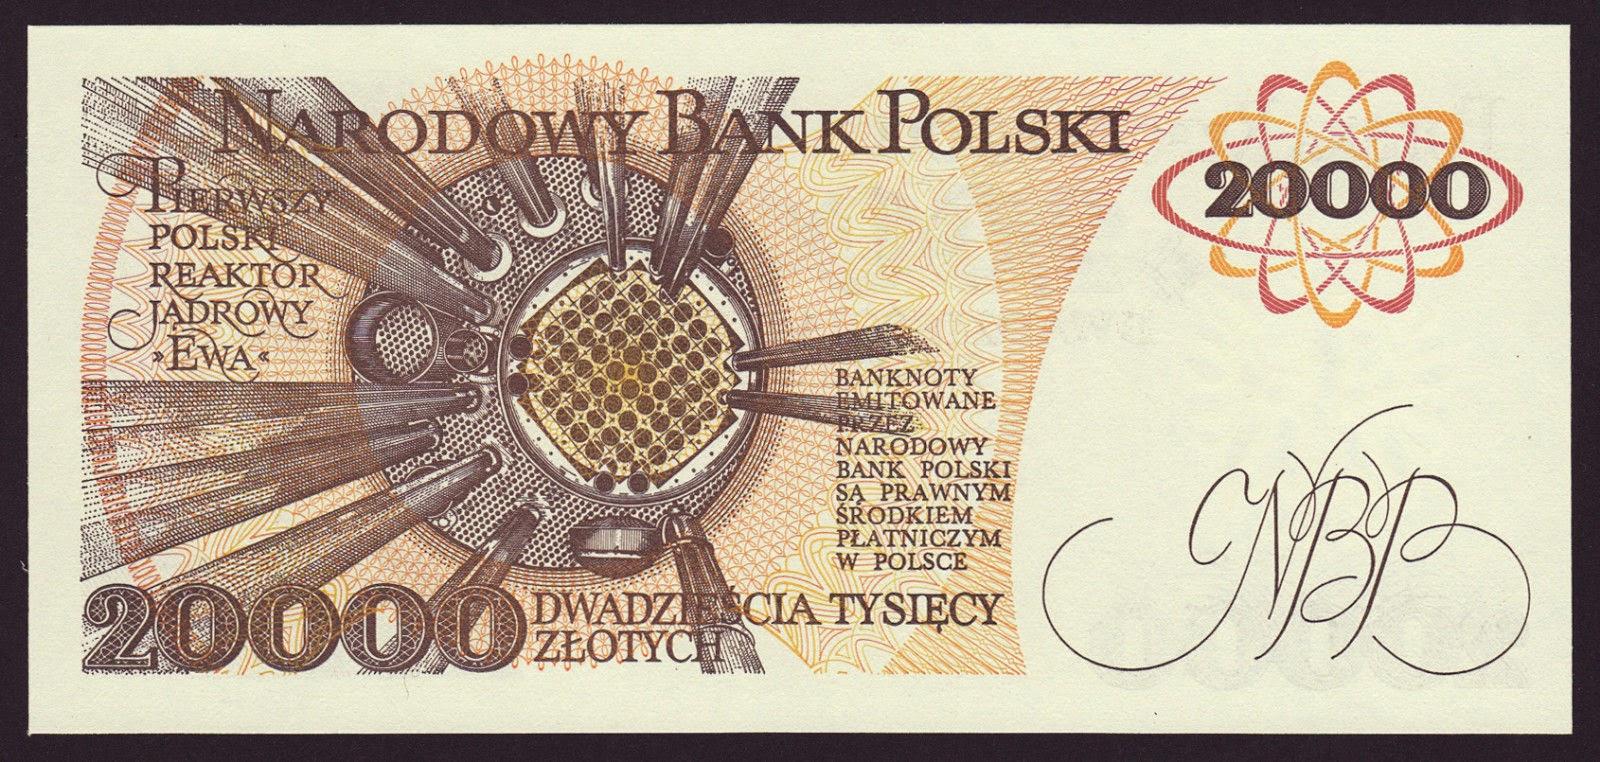 "Poland Banknotes 20000 Zloty banknote 1988 First Polish nuclear reactor ""Ewa"" near Warsaw"